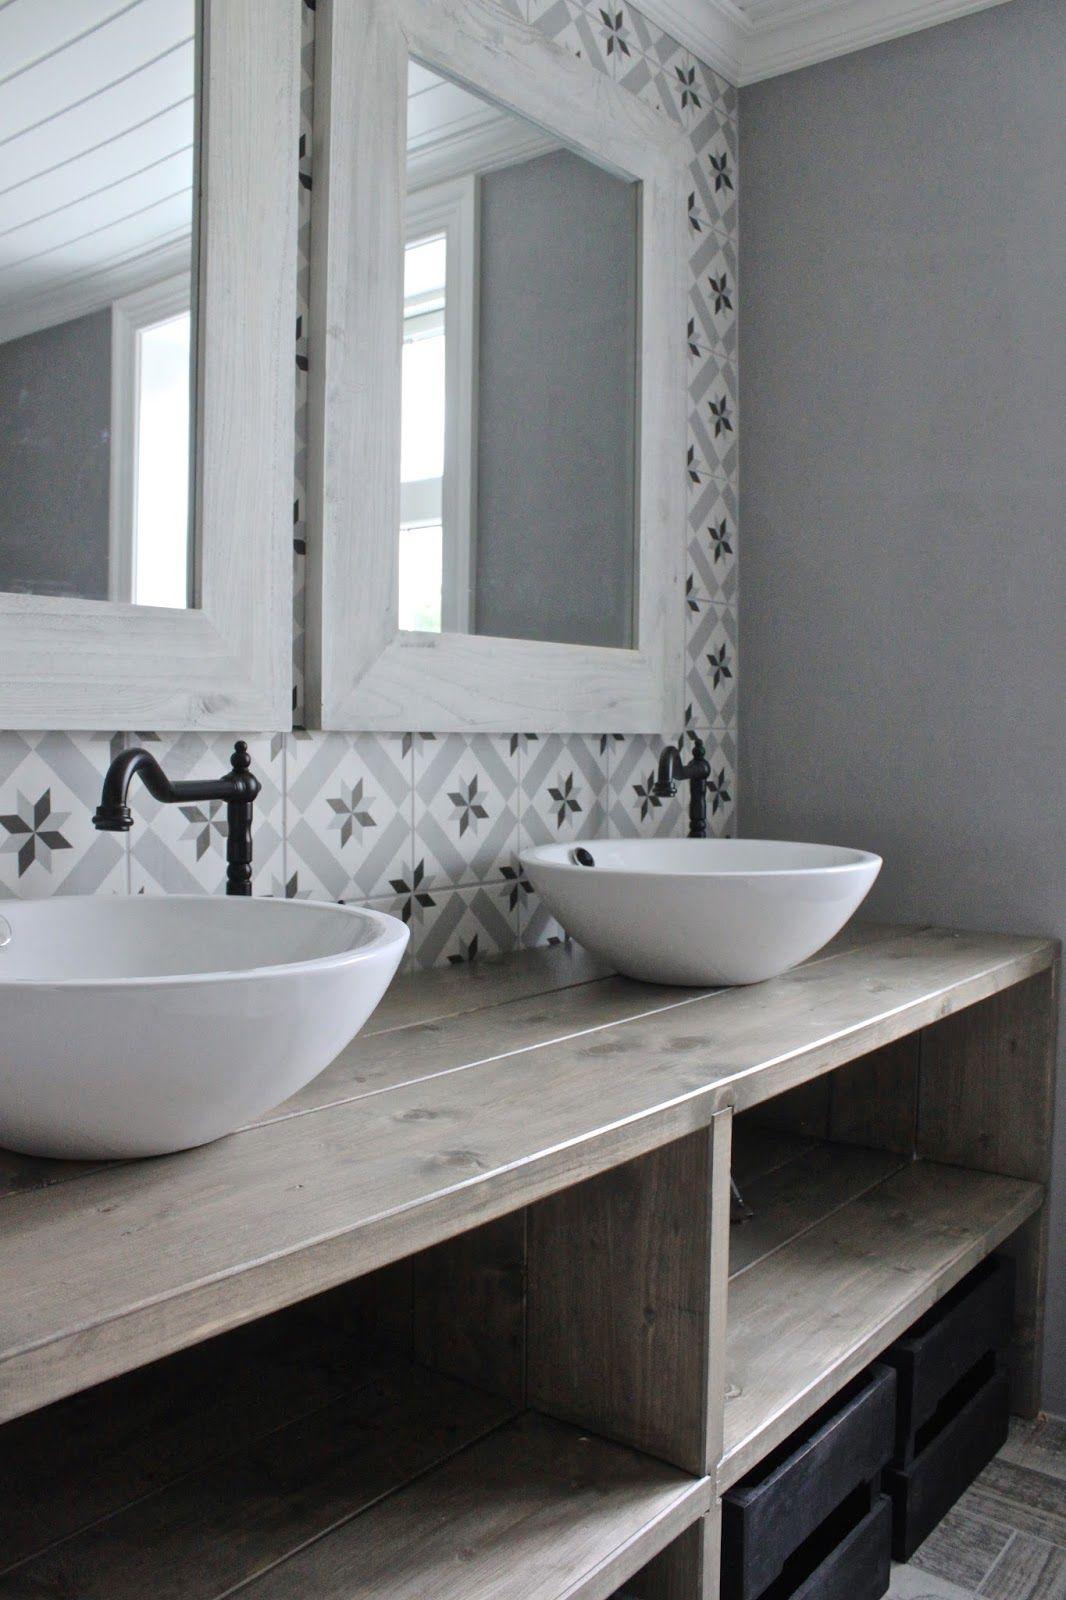 Salle de bain retro rustique carrelage graphiques esprit